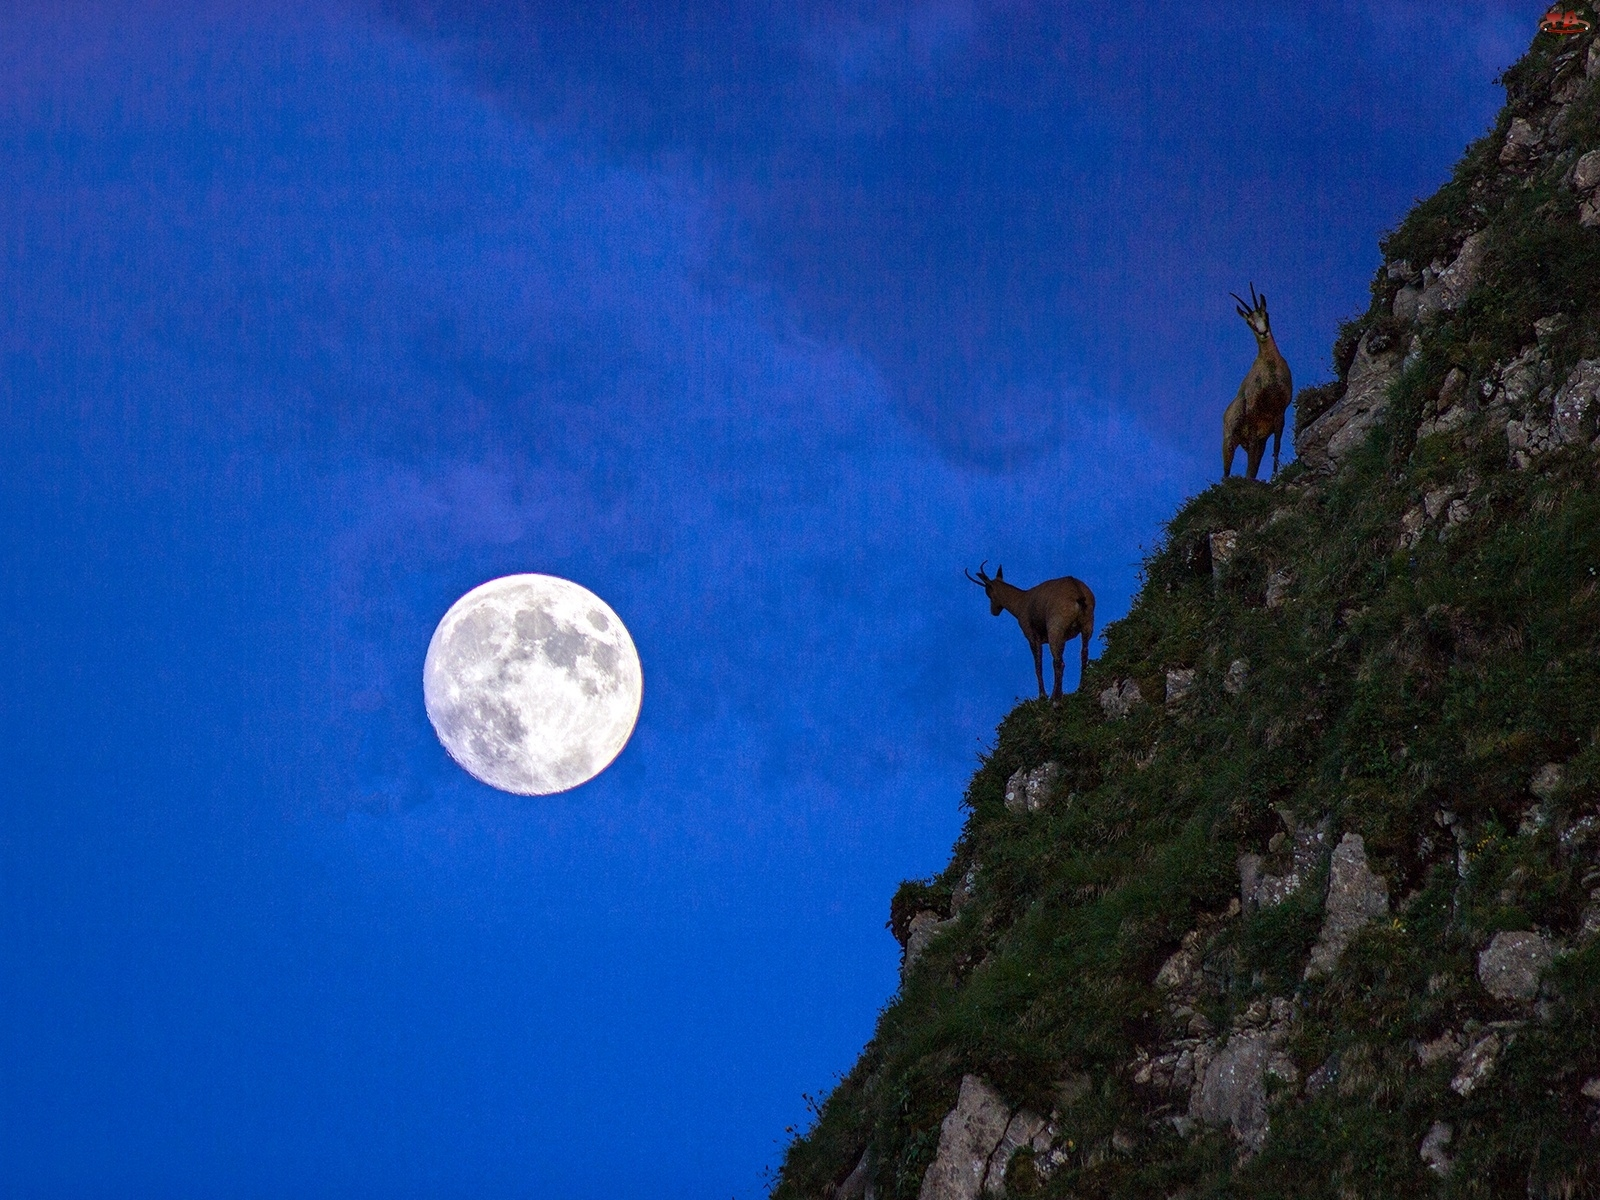 Kozy, Księżyc, Góry